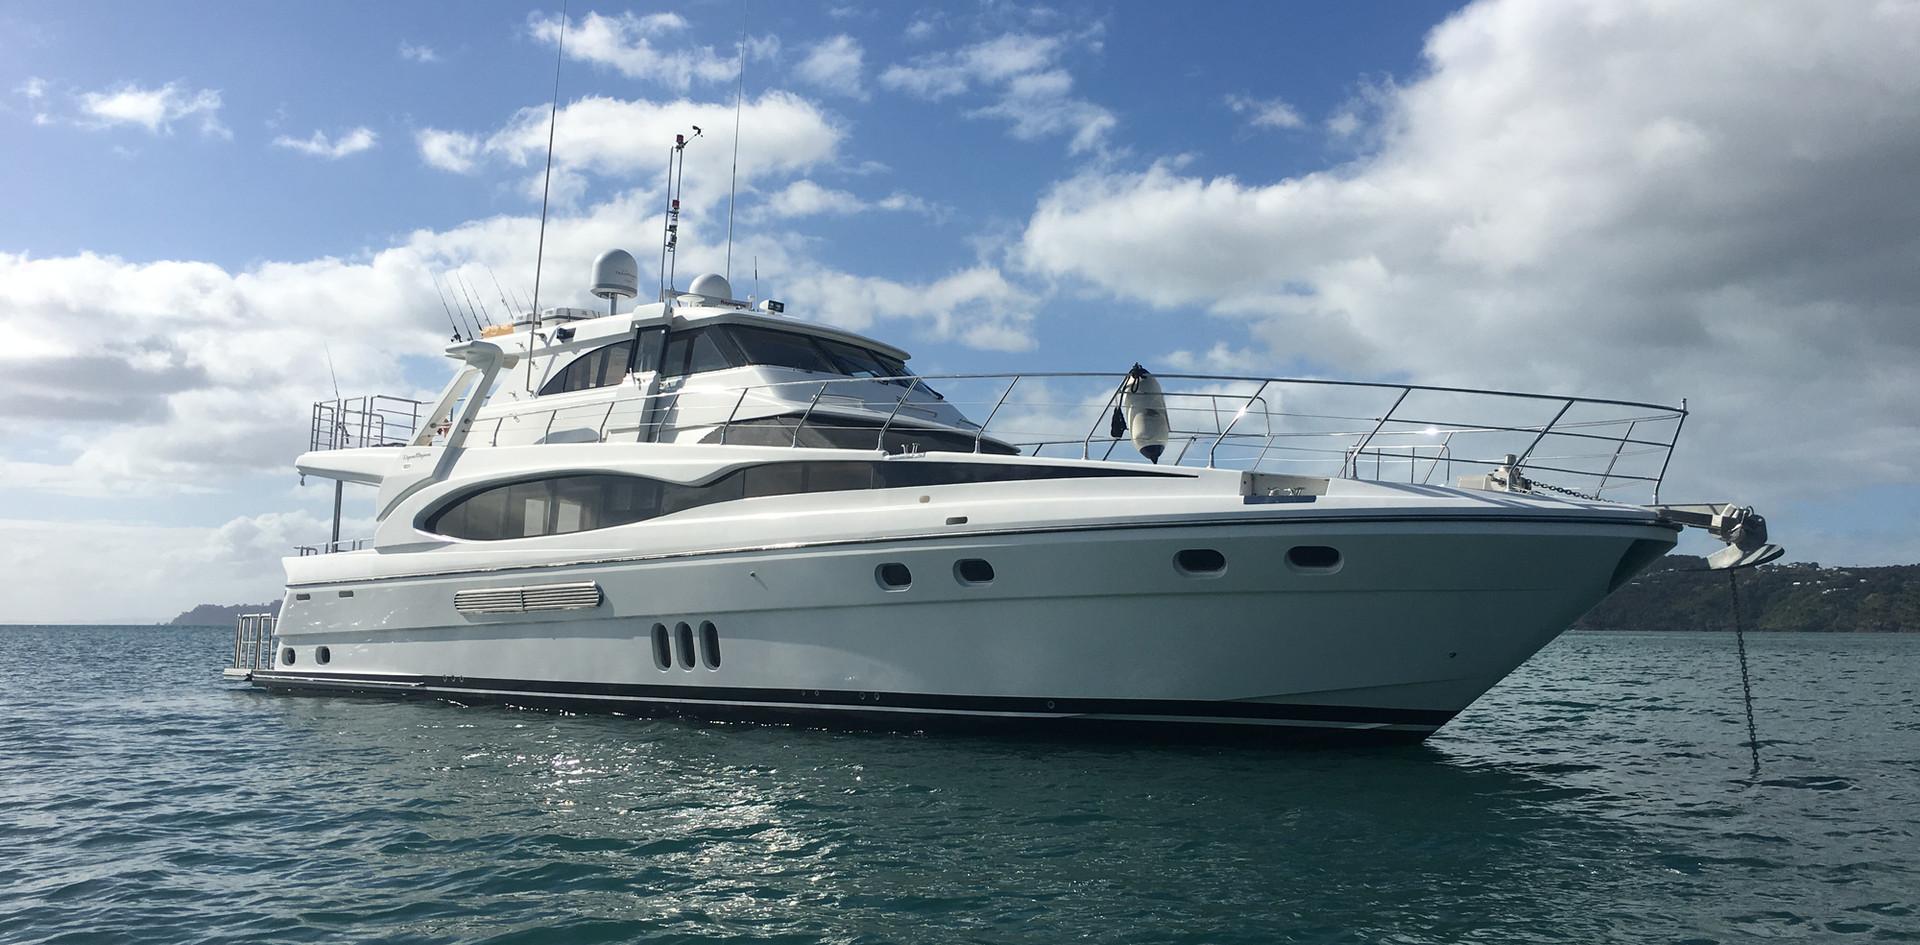 Tawaki Charter Boat